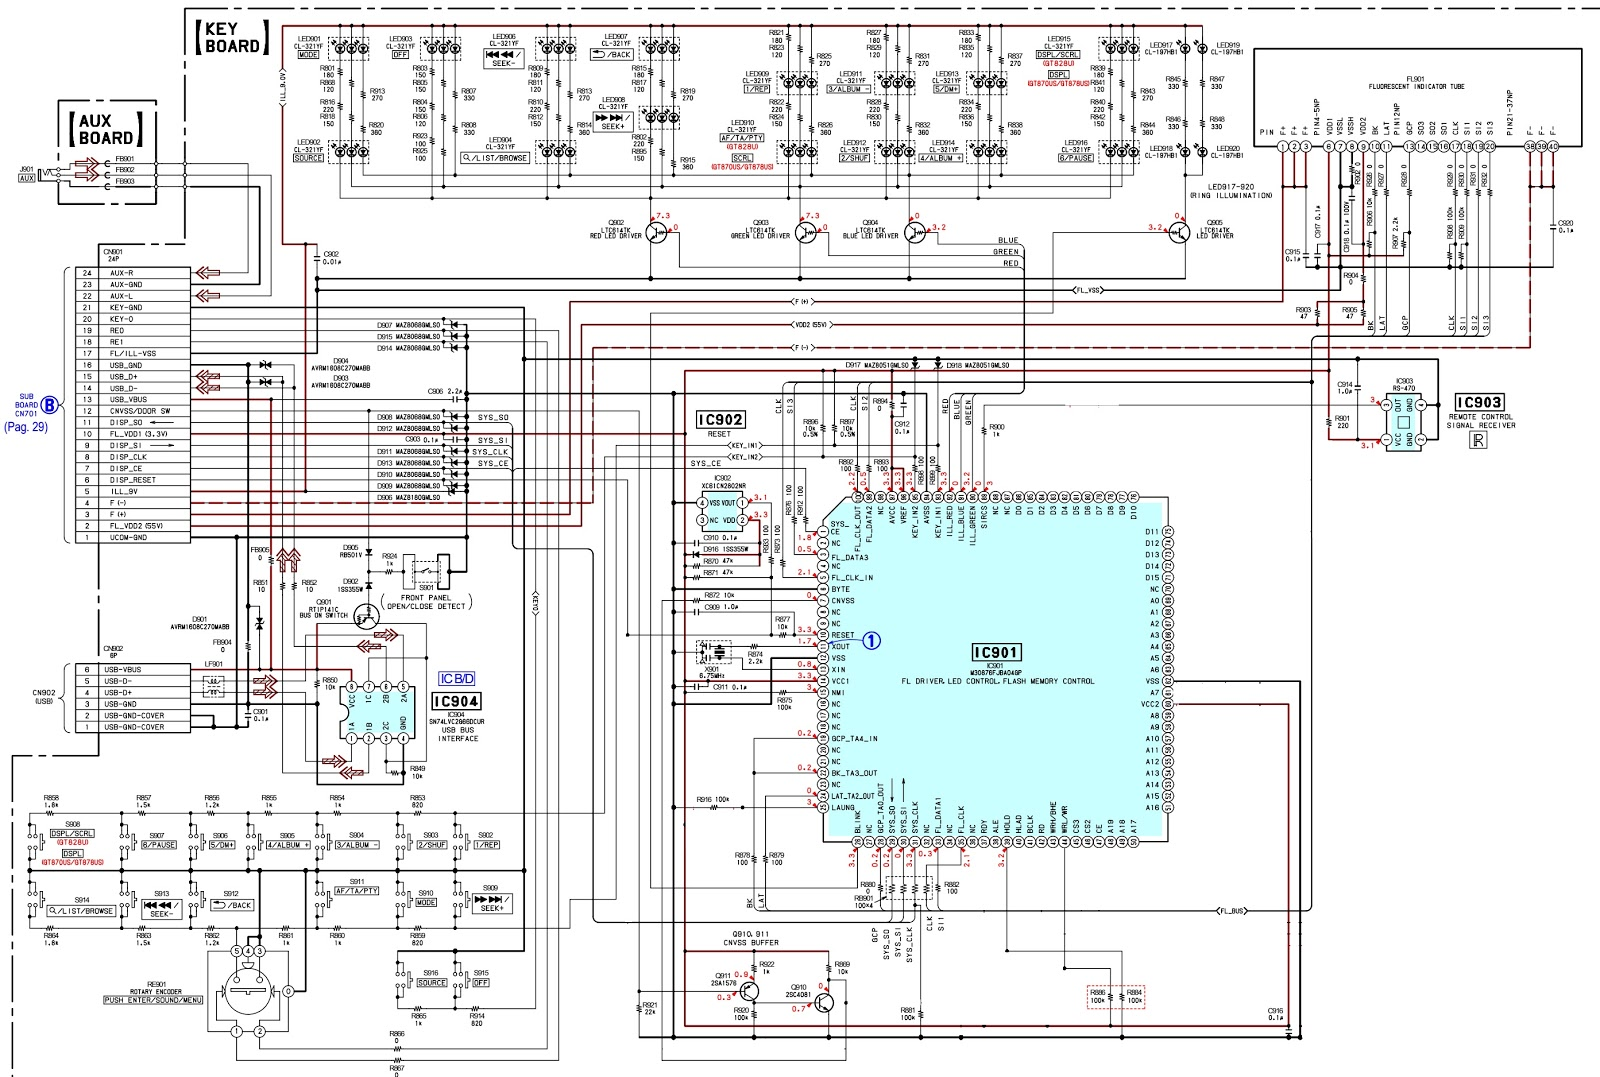 Cdx Gt827ux Sony Car Radio Circuit Diagram Wiring Diagram Error Codes